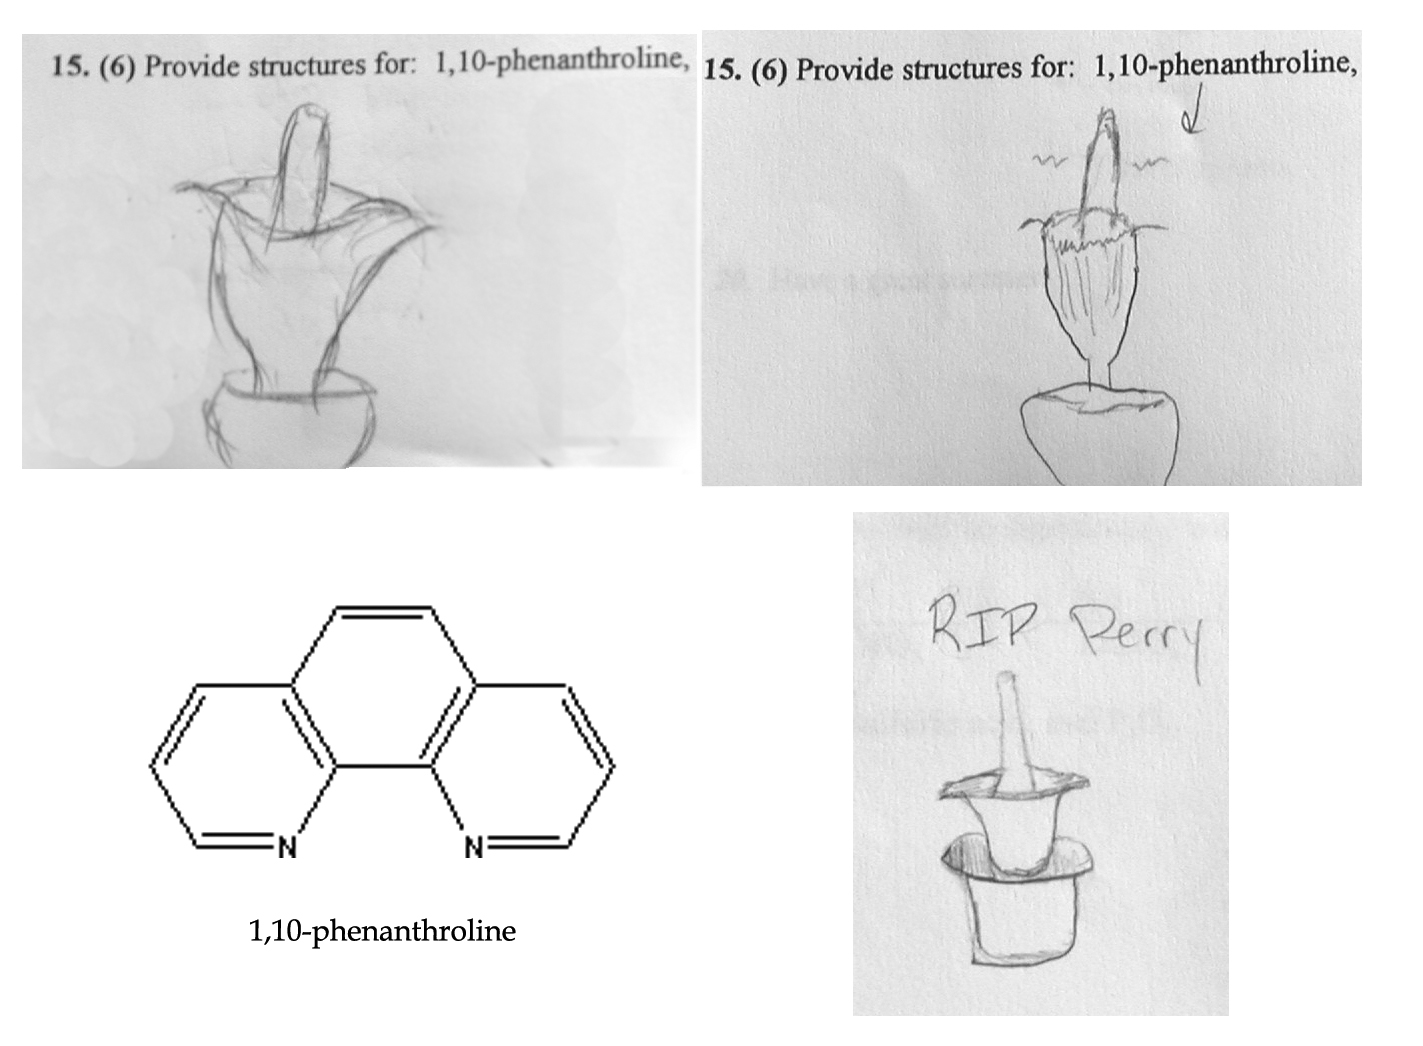 Perry Amp Inorganic Students Amp 1 10 Phenanthroline Posted